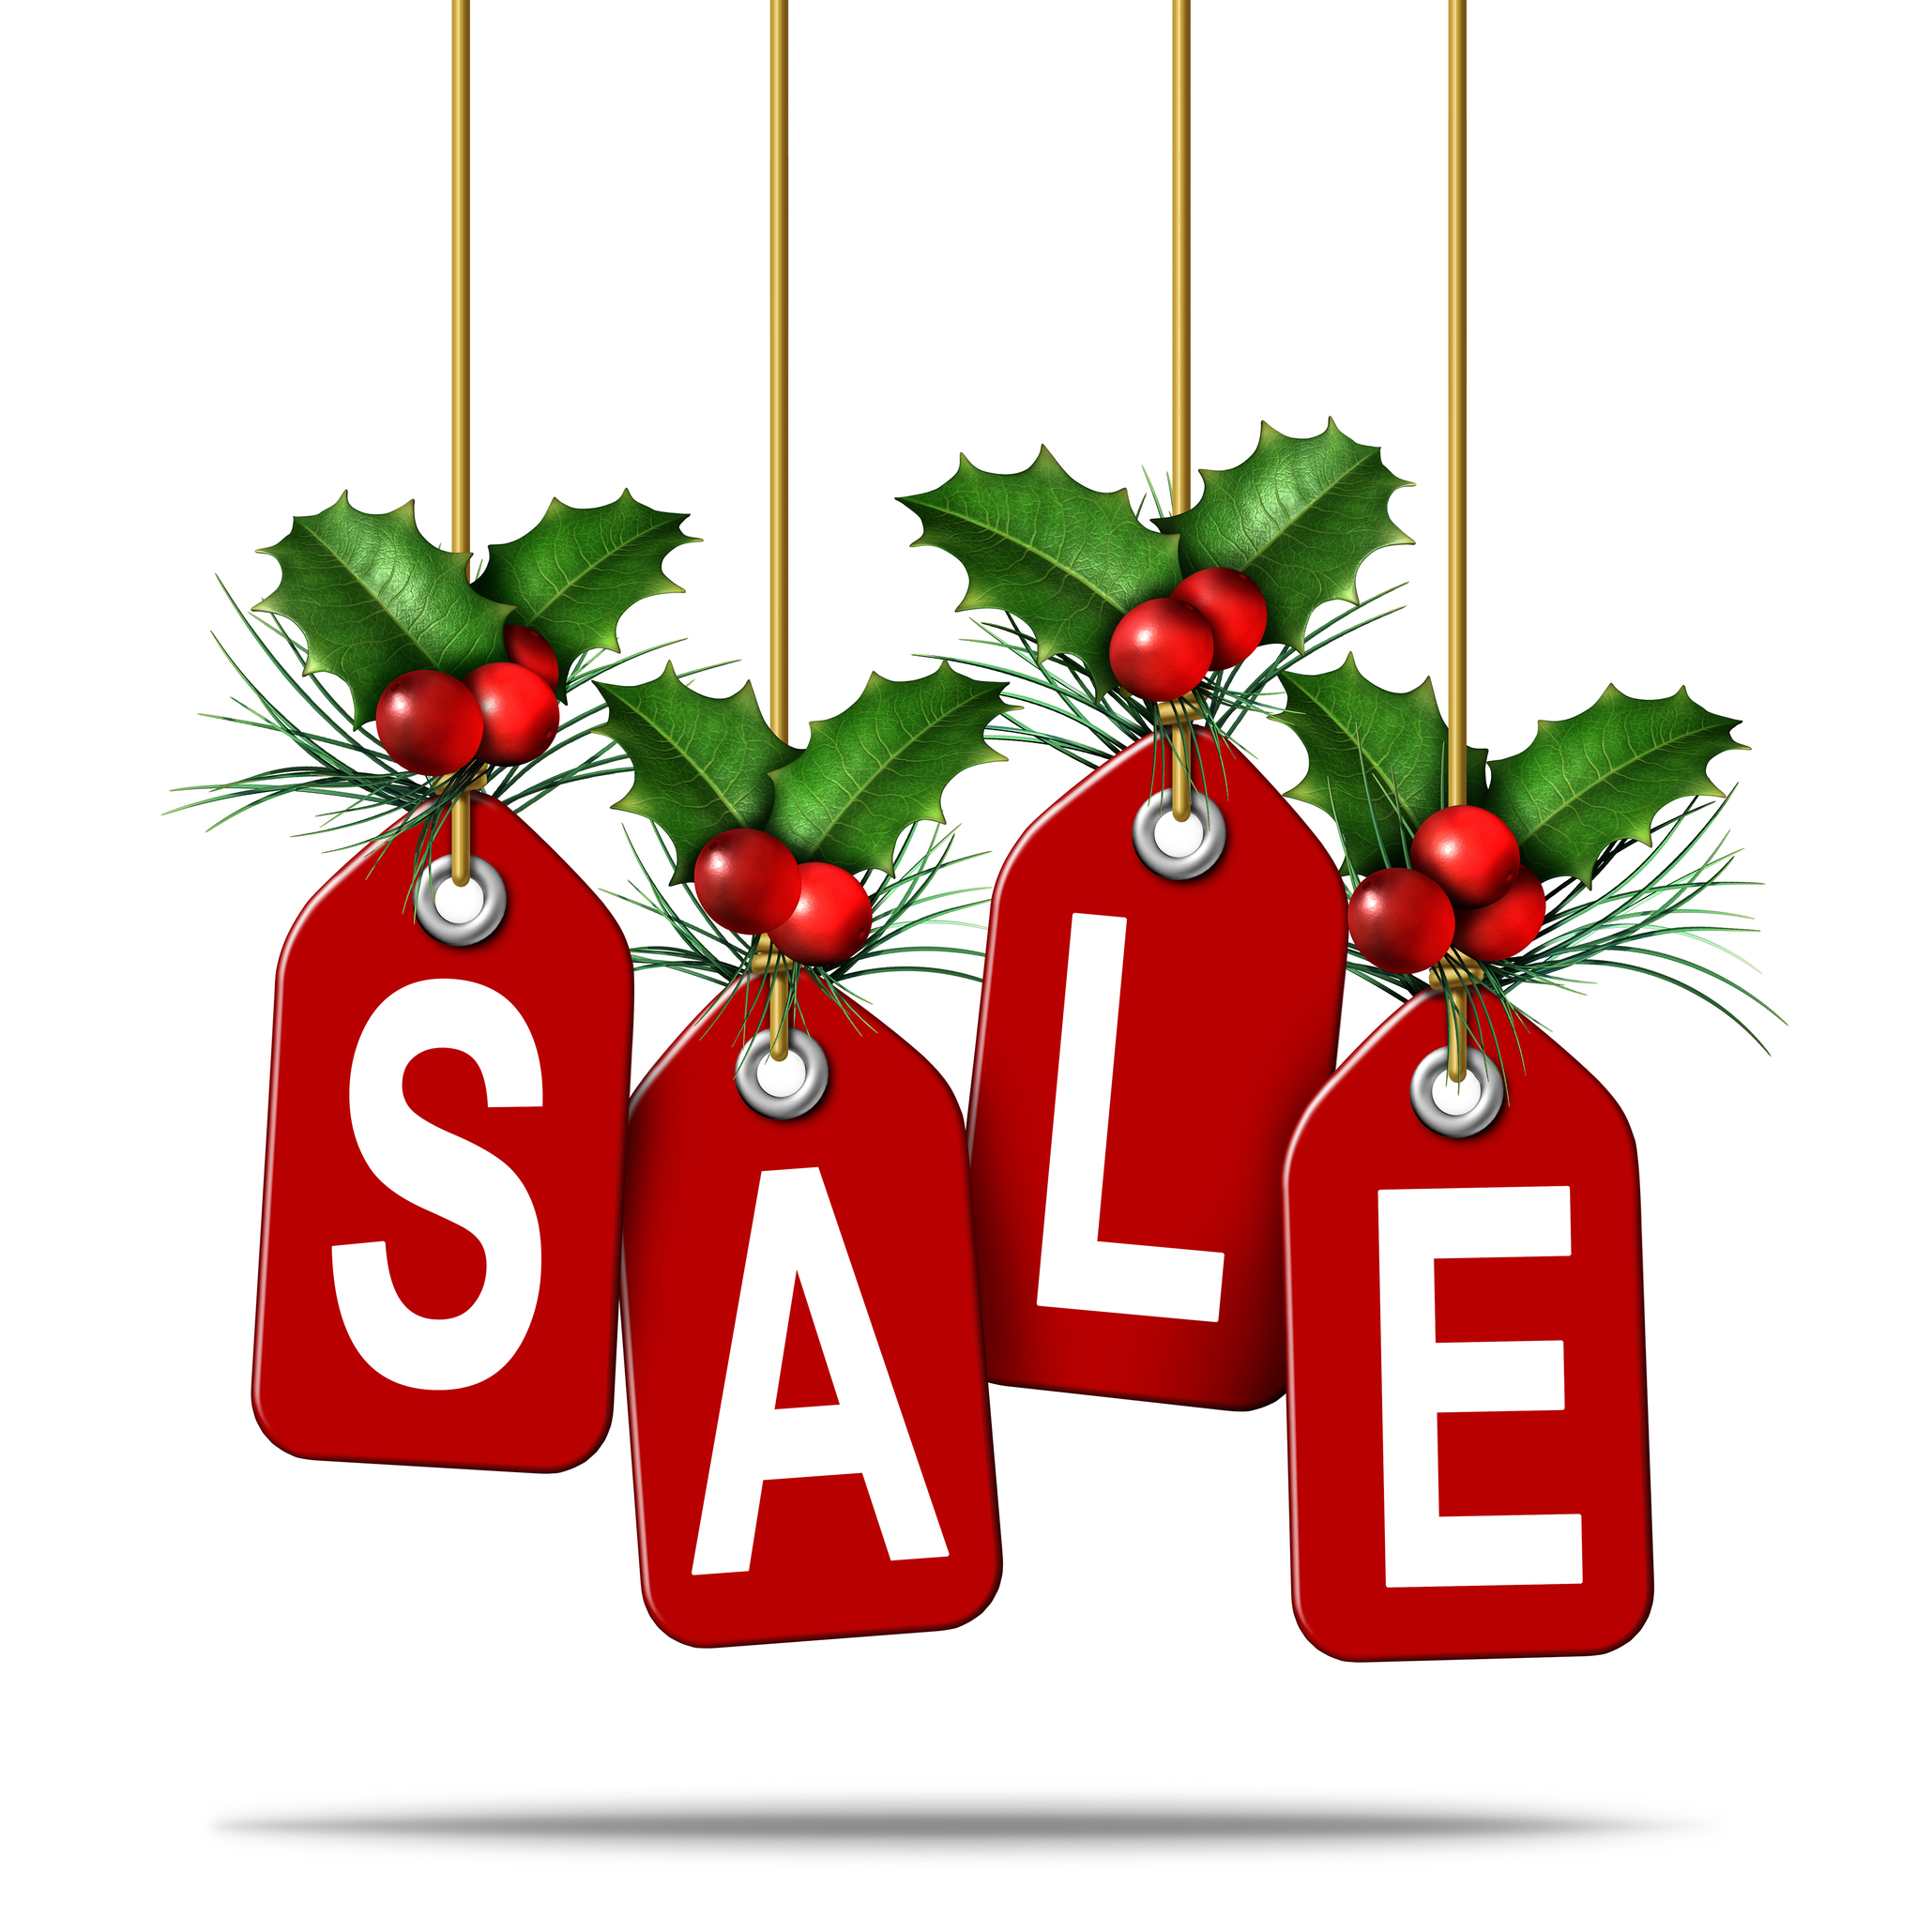 price-tag-sale